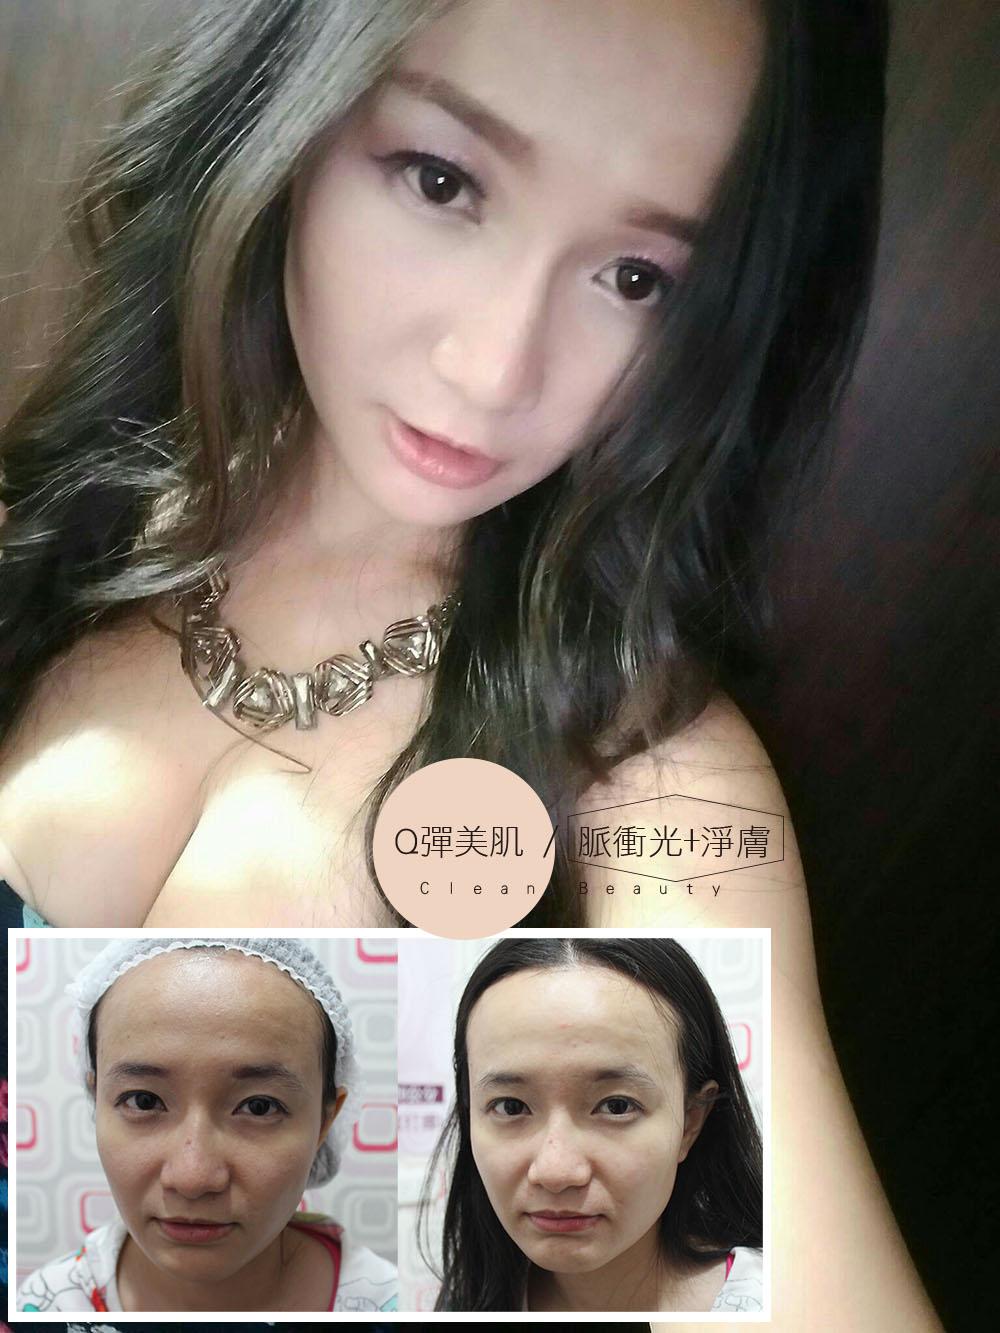 Read more about the article 雞尾酒雷射+午間美容脈衝光美肌好享受